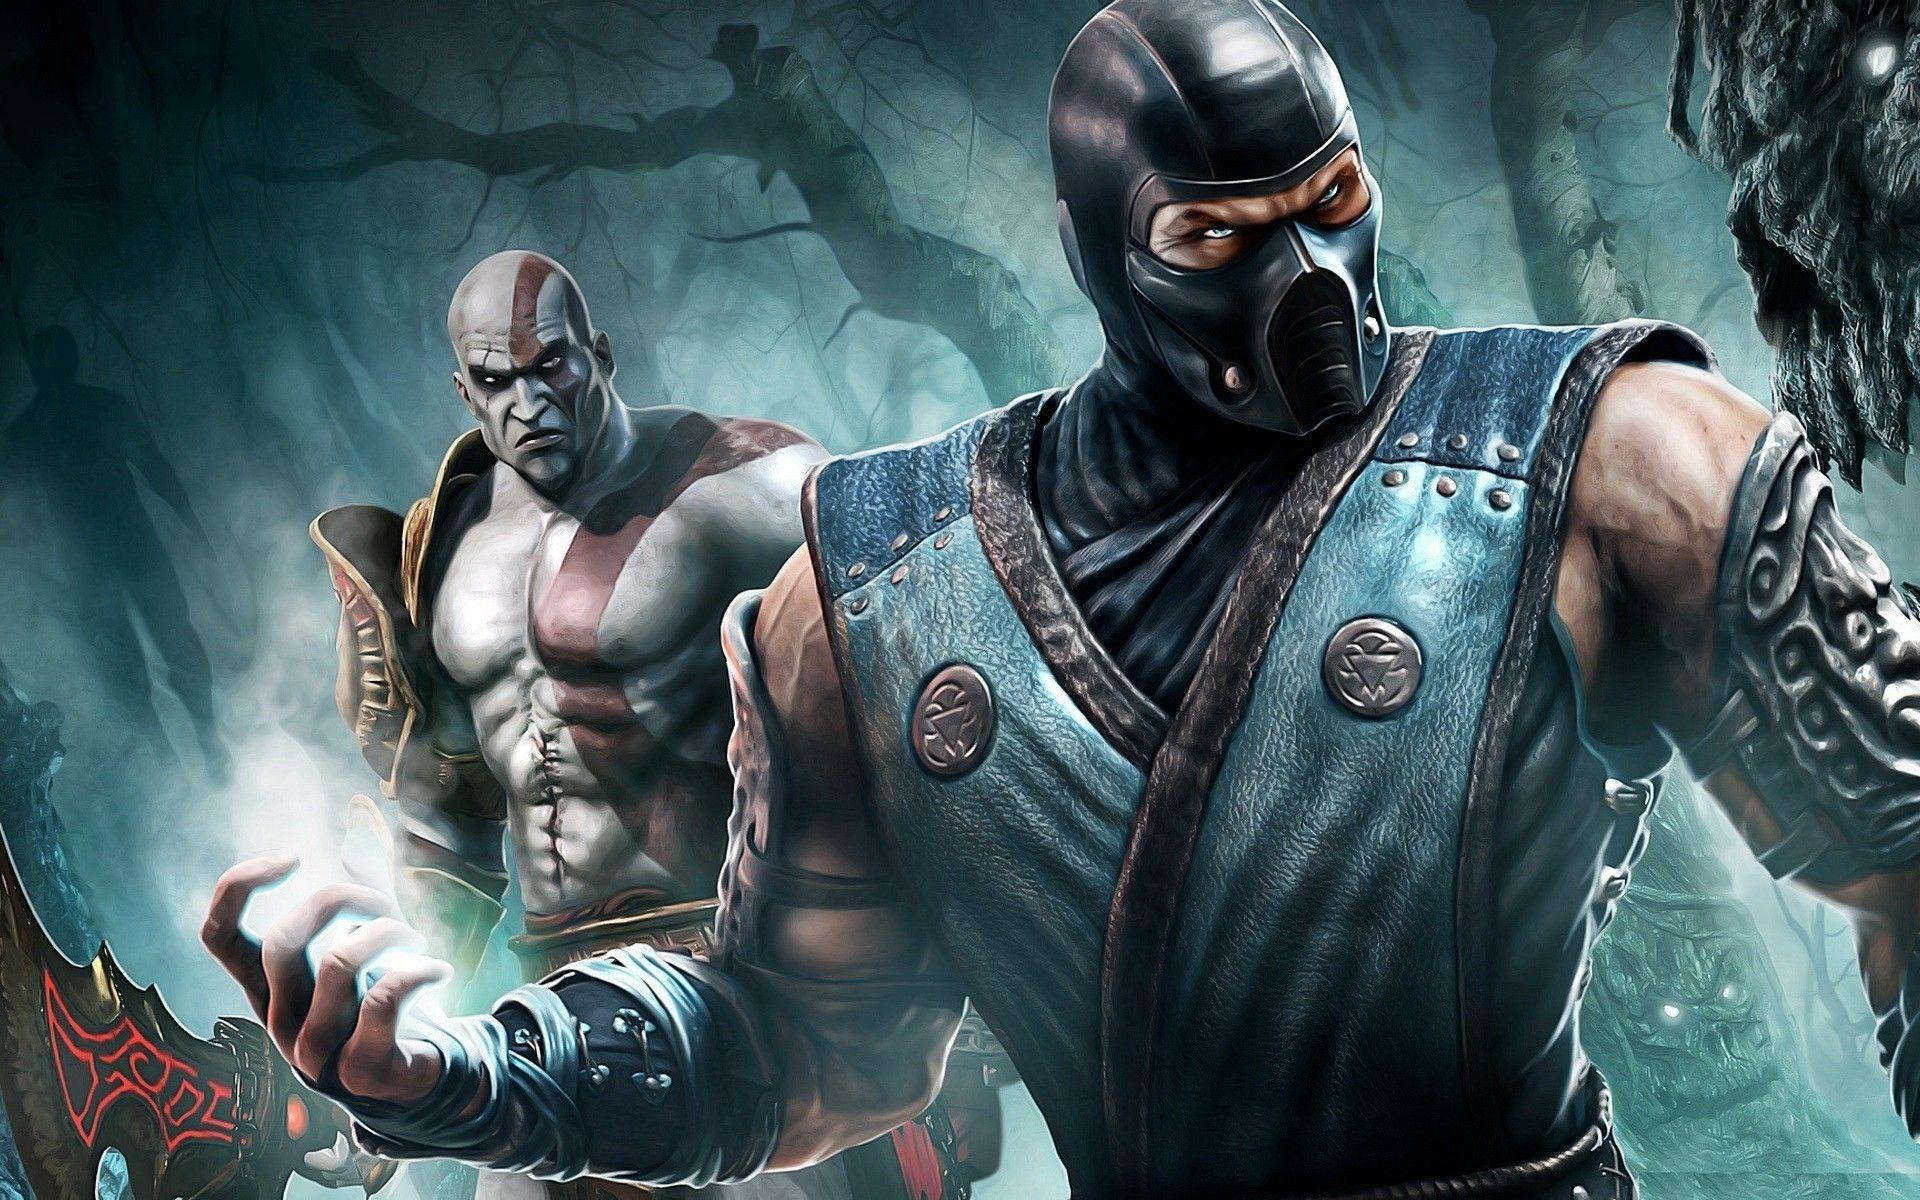 Hd wallpaper games - Dishonored Videogames Wallpaper Wallpapers Pinterest Hd